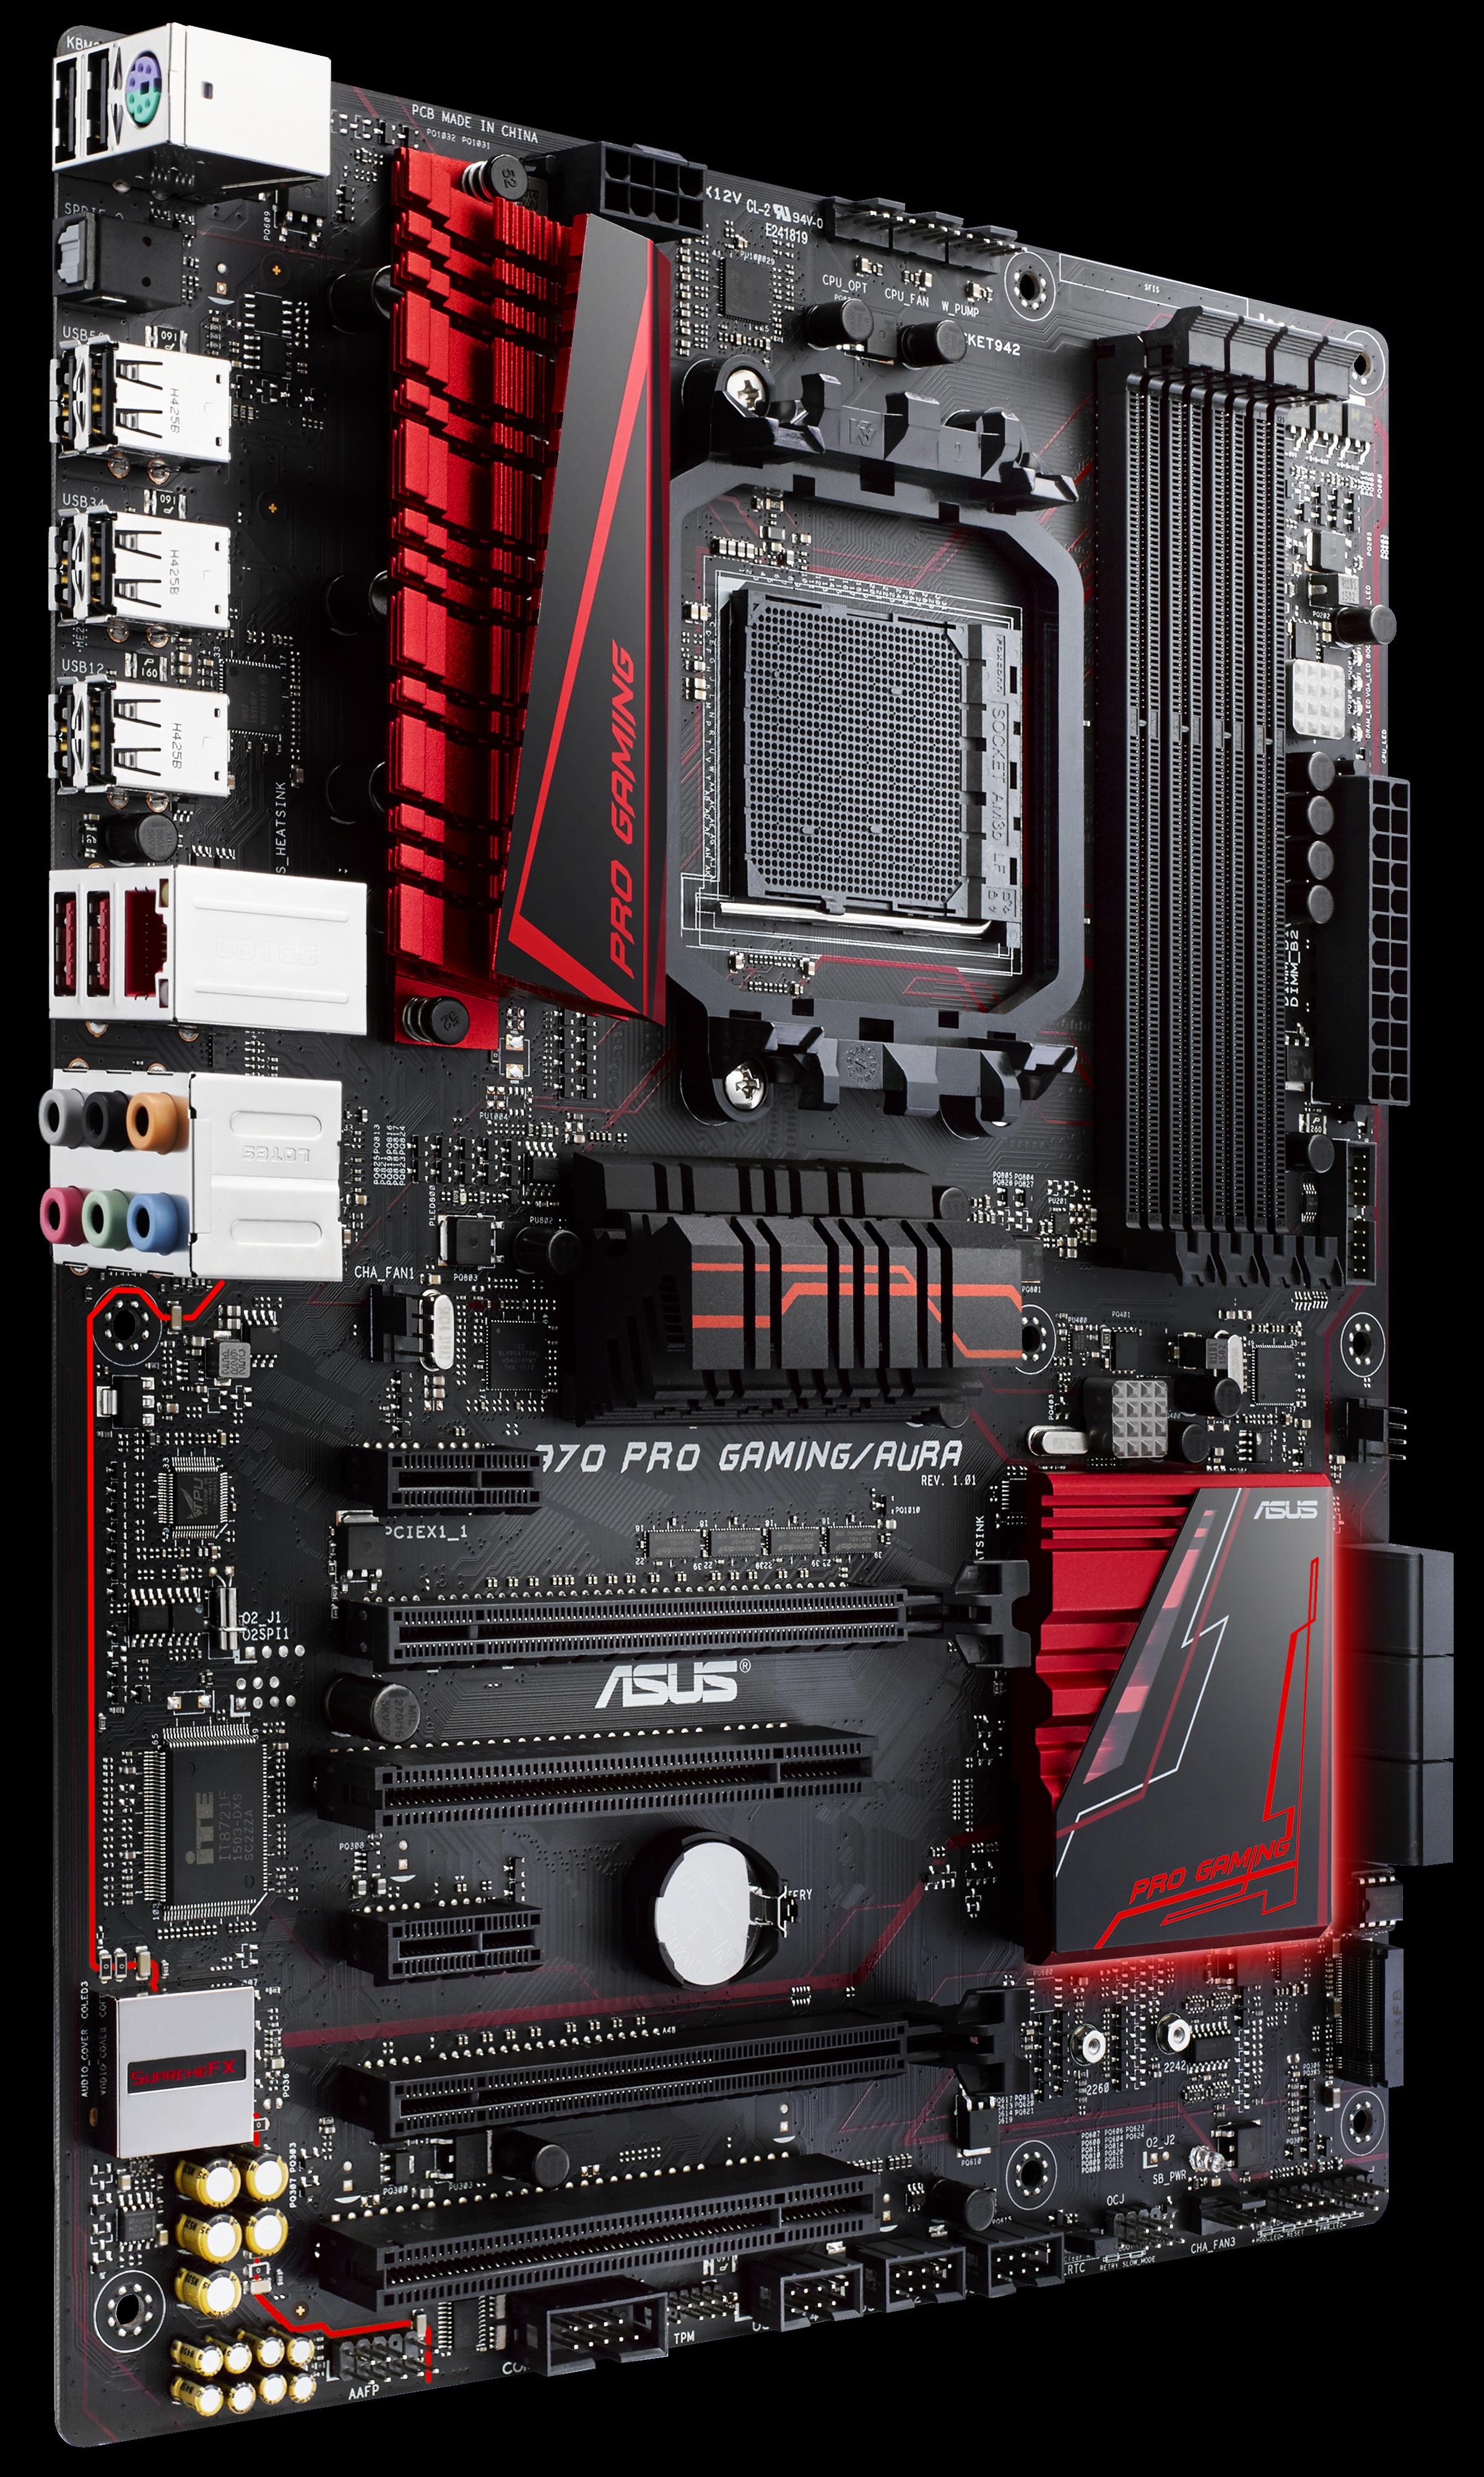 BIOS Chip ASUS 970 PRO GAMING//AURA